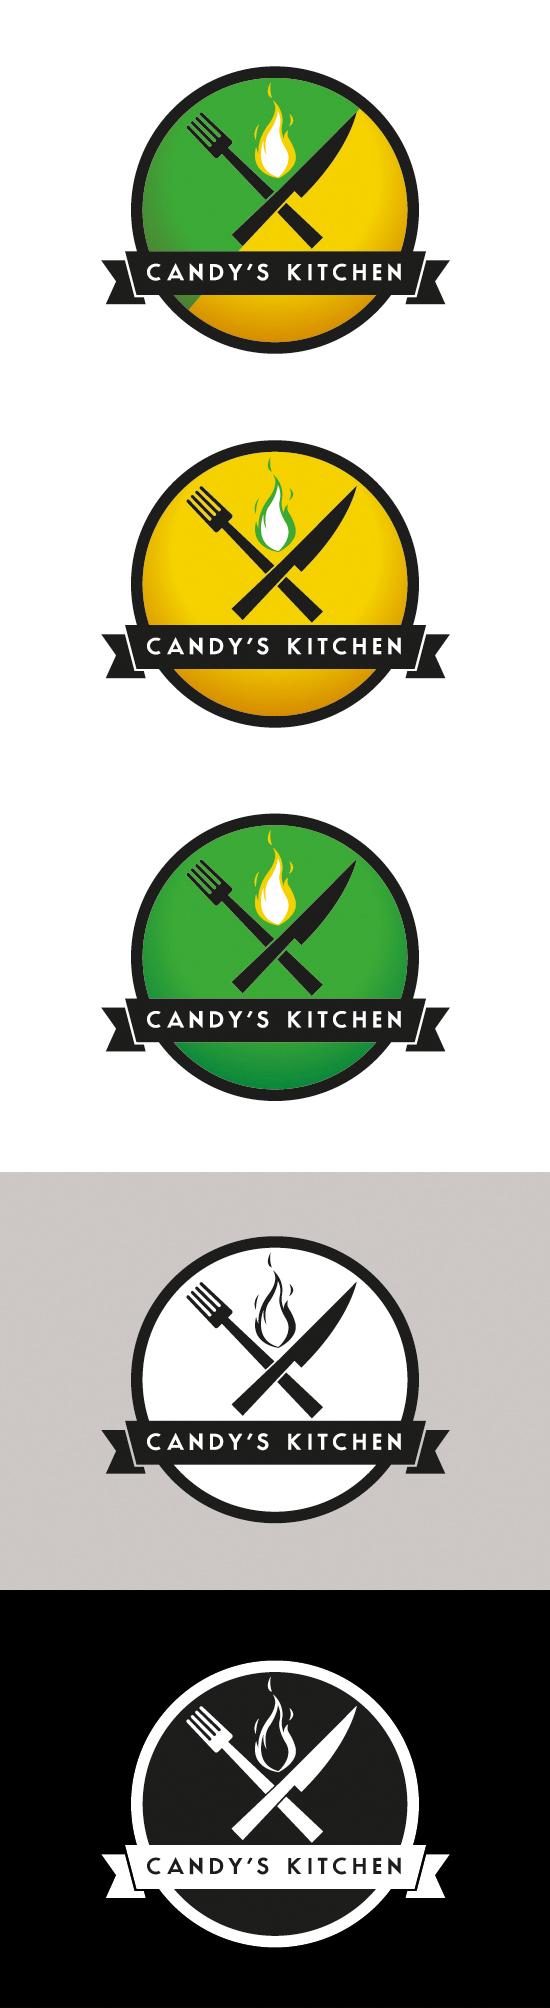 Candy's Kitchen